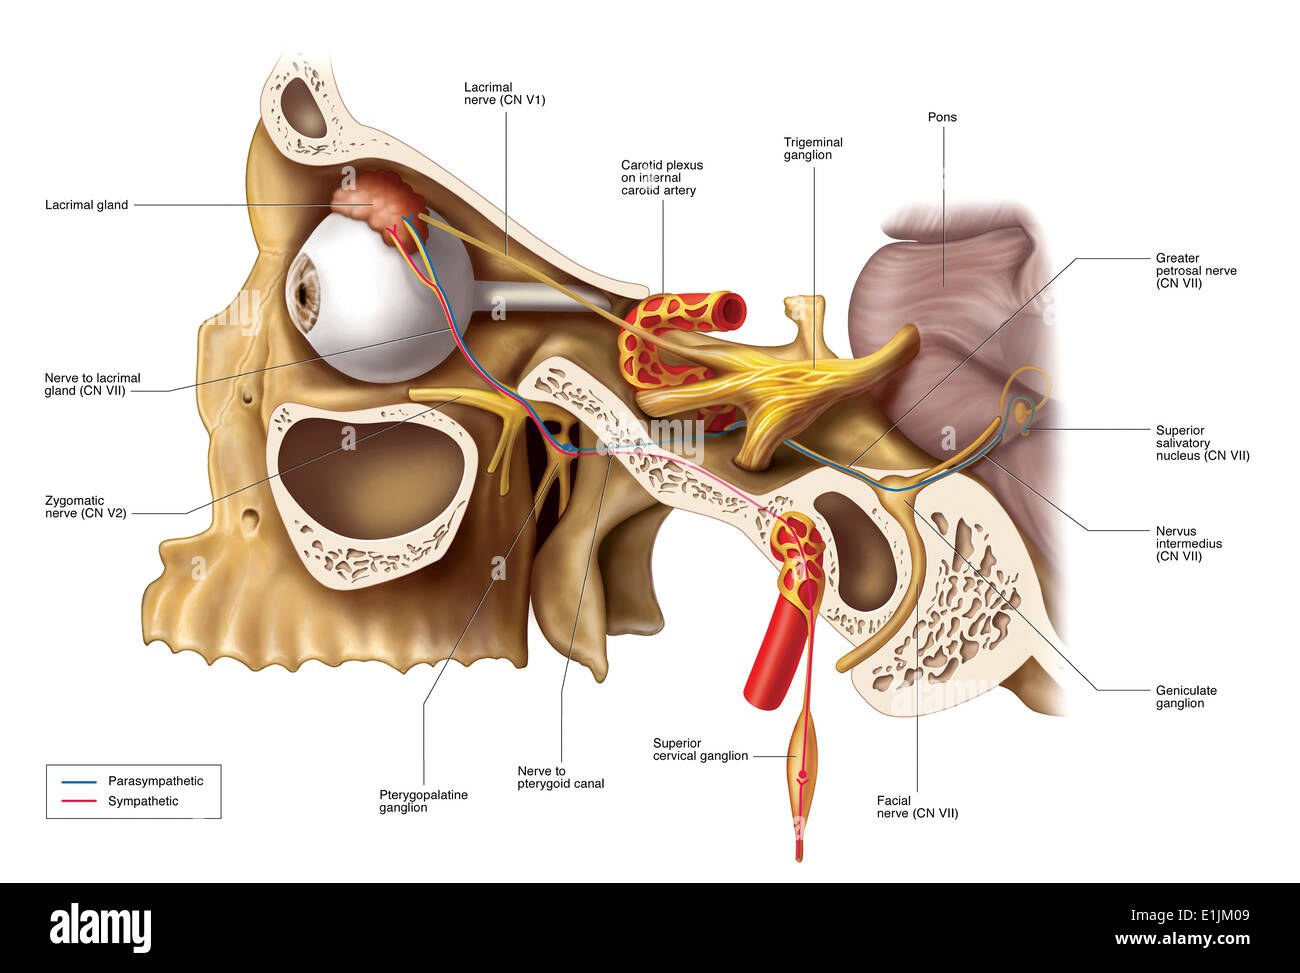 Images of Lacrimal Gland Anatomy - #SpaceHero